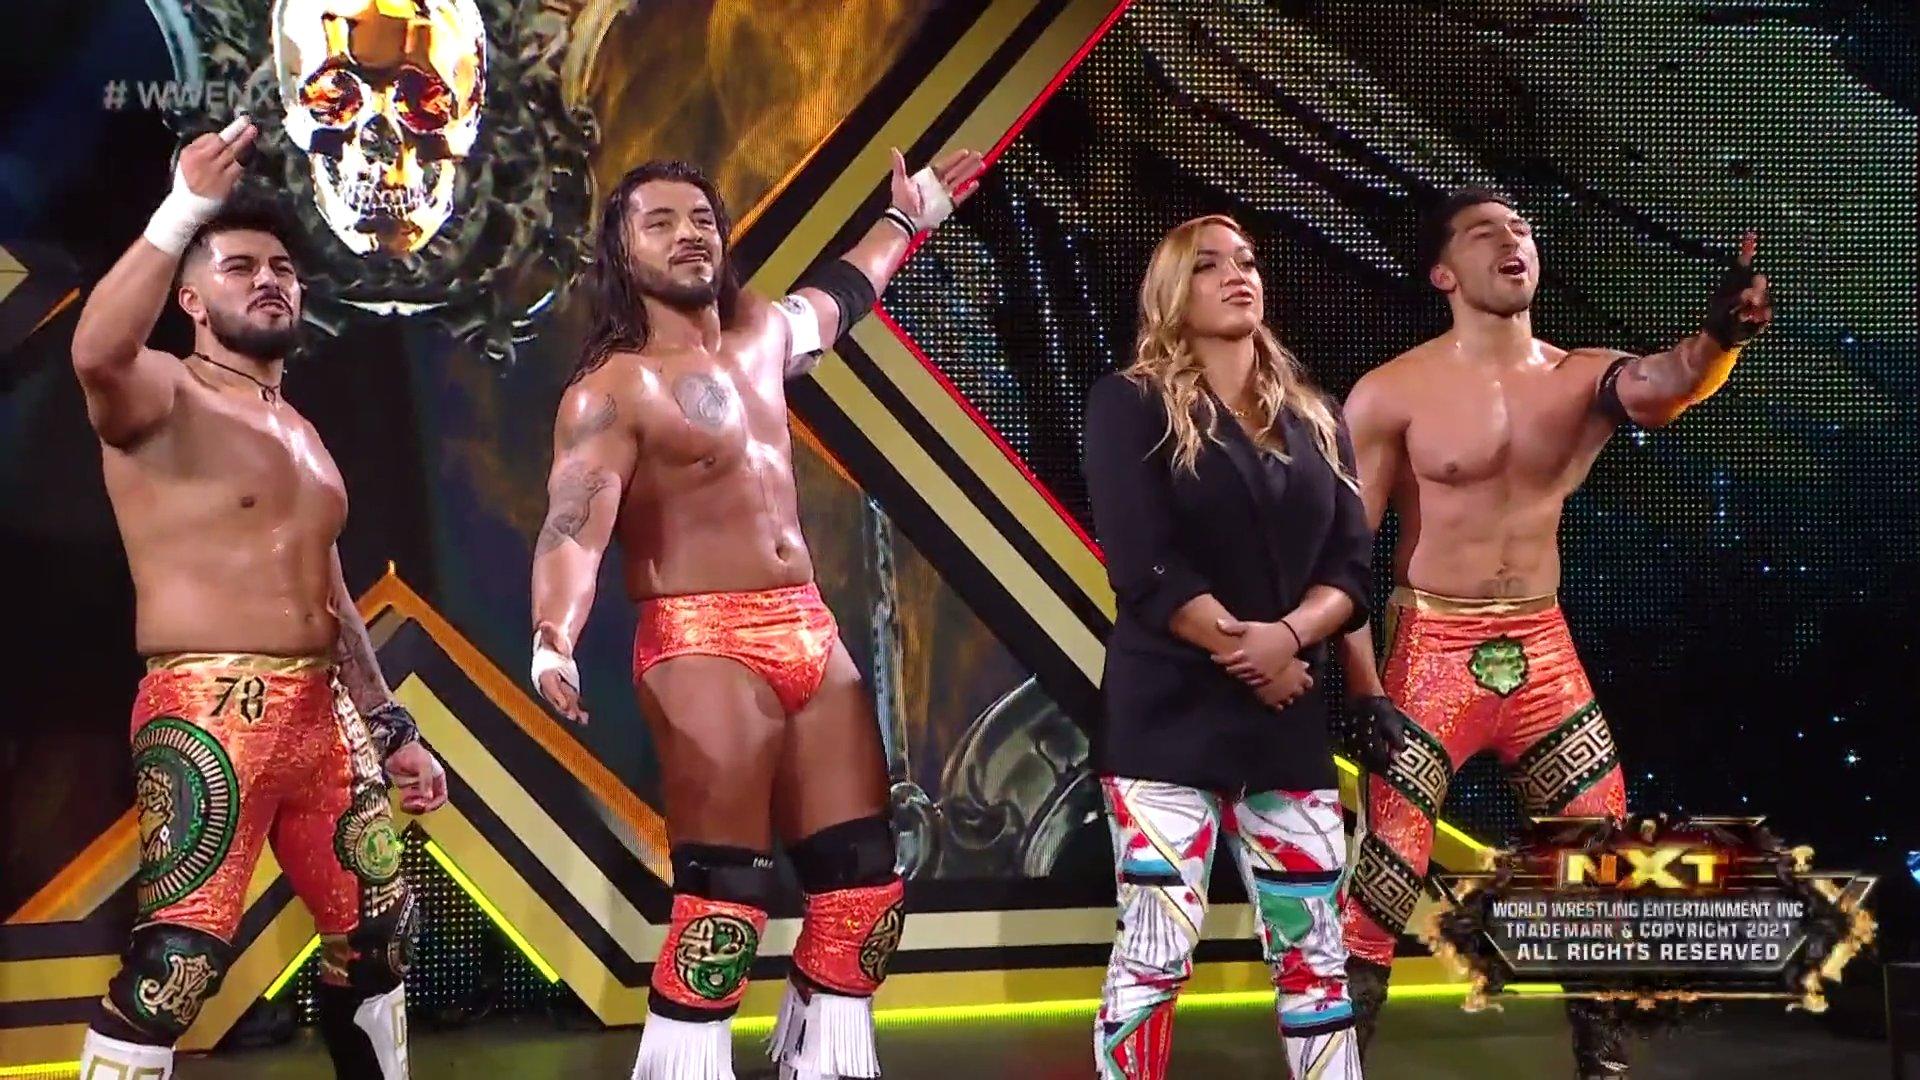 WWE NXT Results (24/08/21): Six-Man Tag Team Match; BreakOut Tourney Final 65